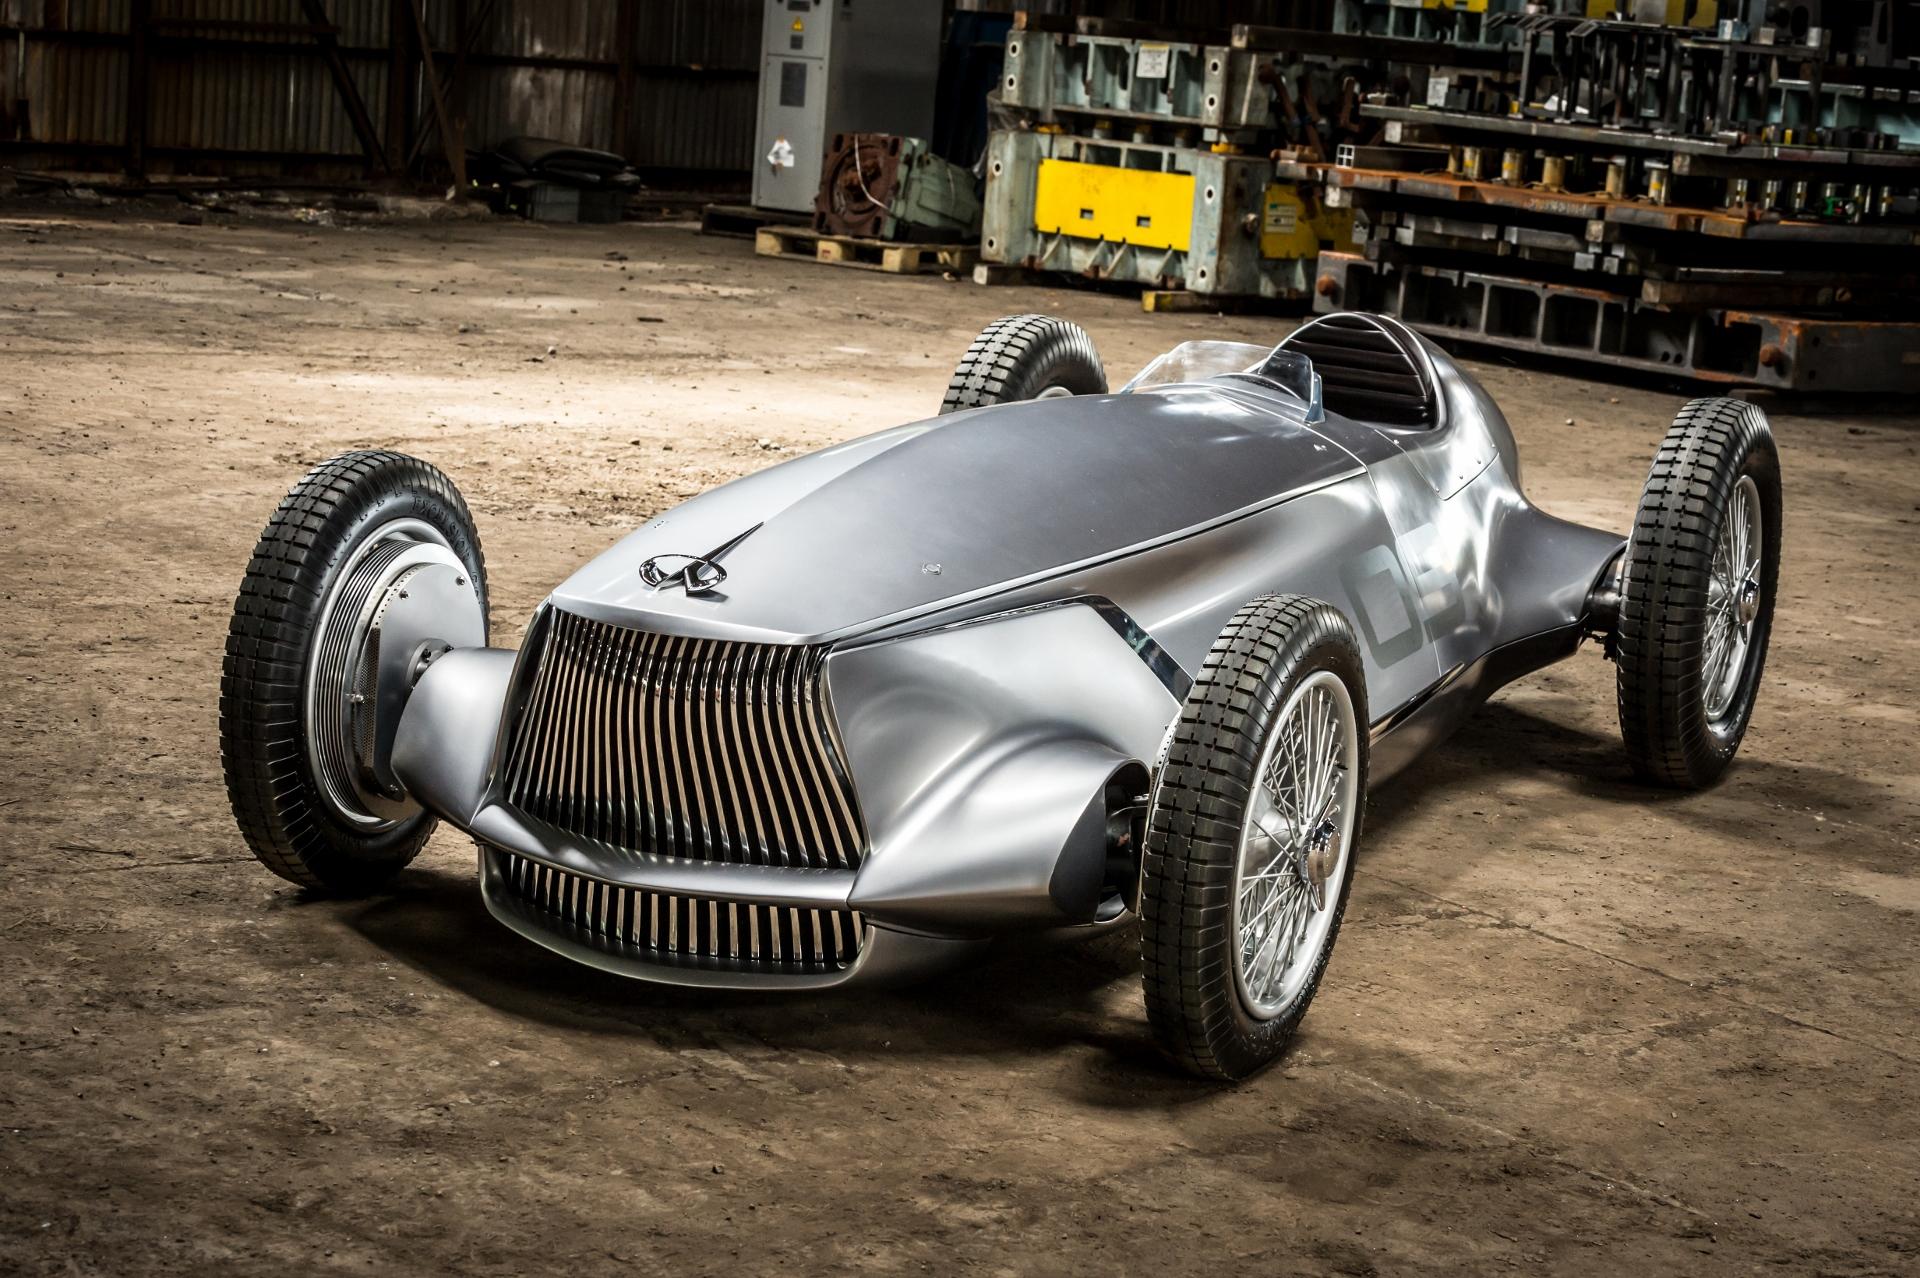 infiniti reveals  u0026 39 what if u0026 39  prototype 9 1940s grand prix racer ahead of pebble beach